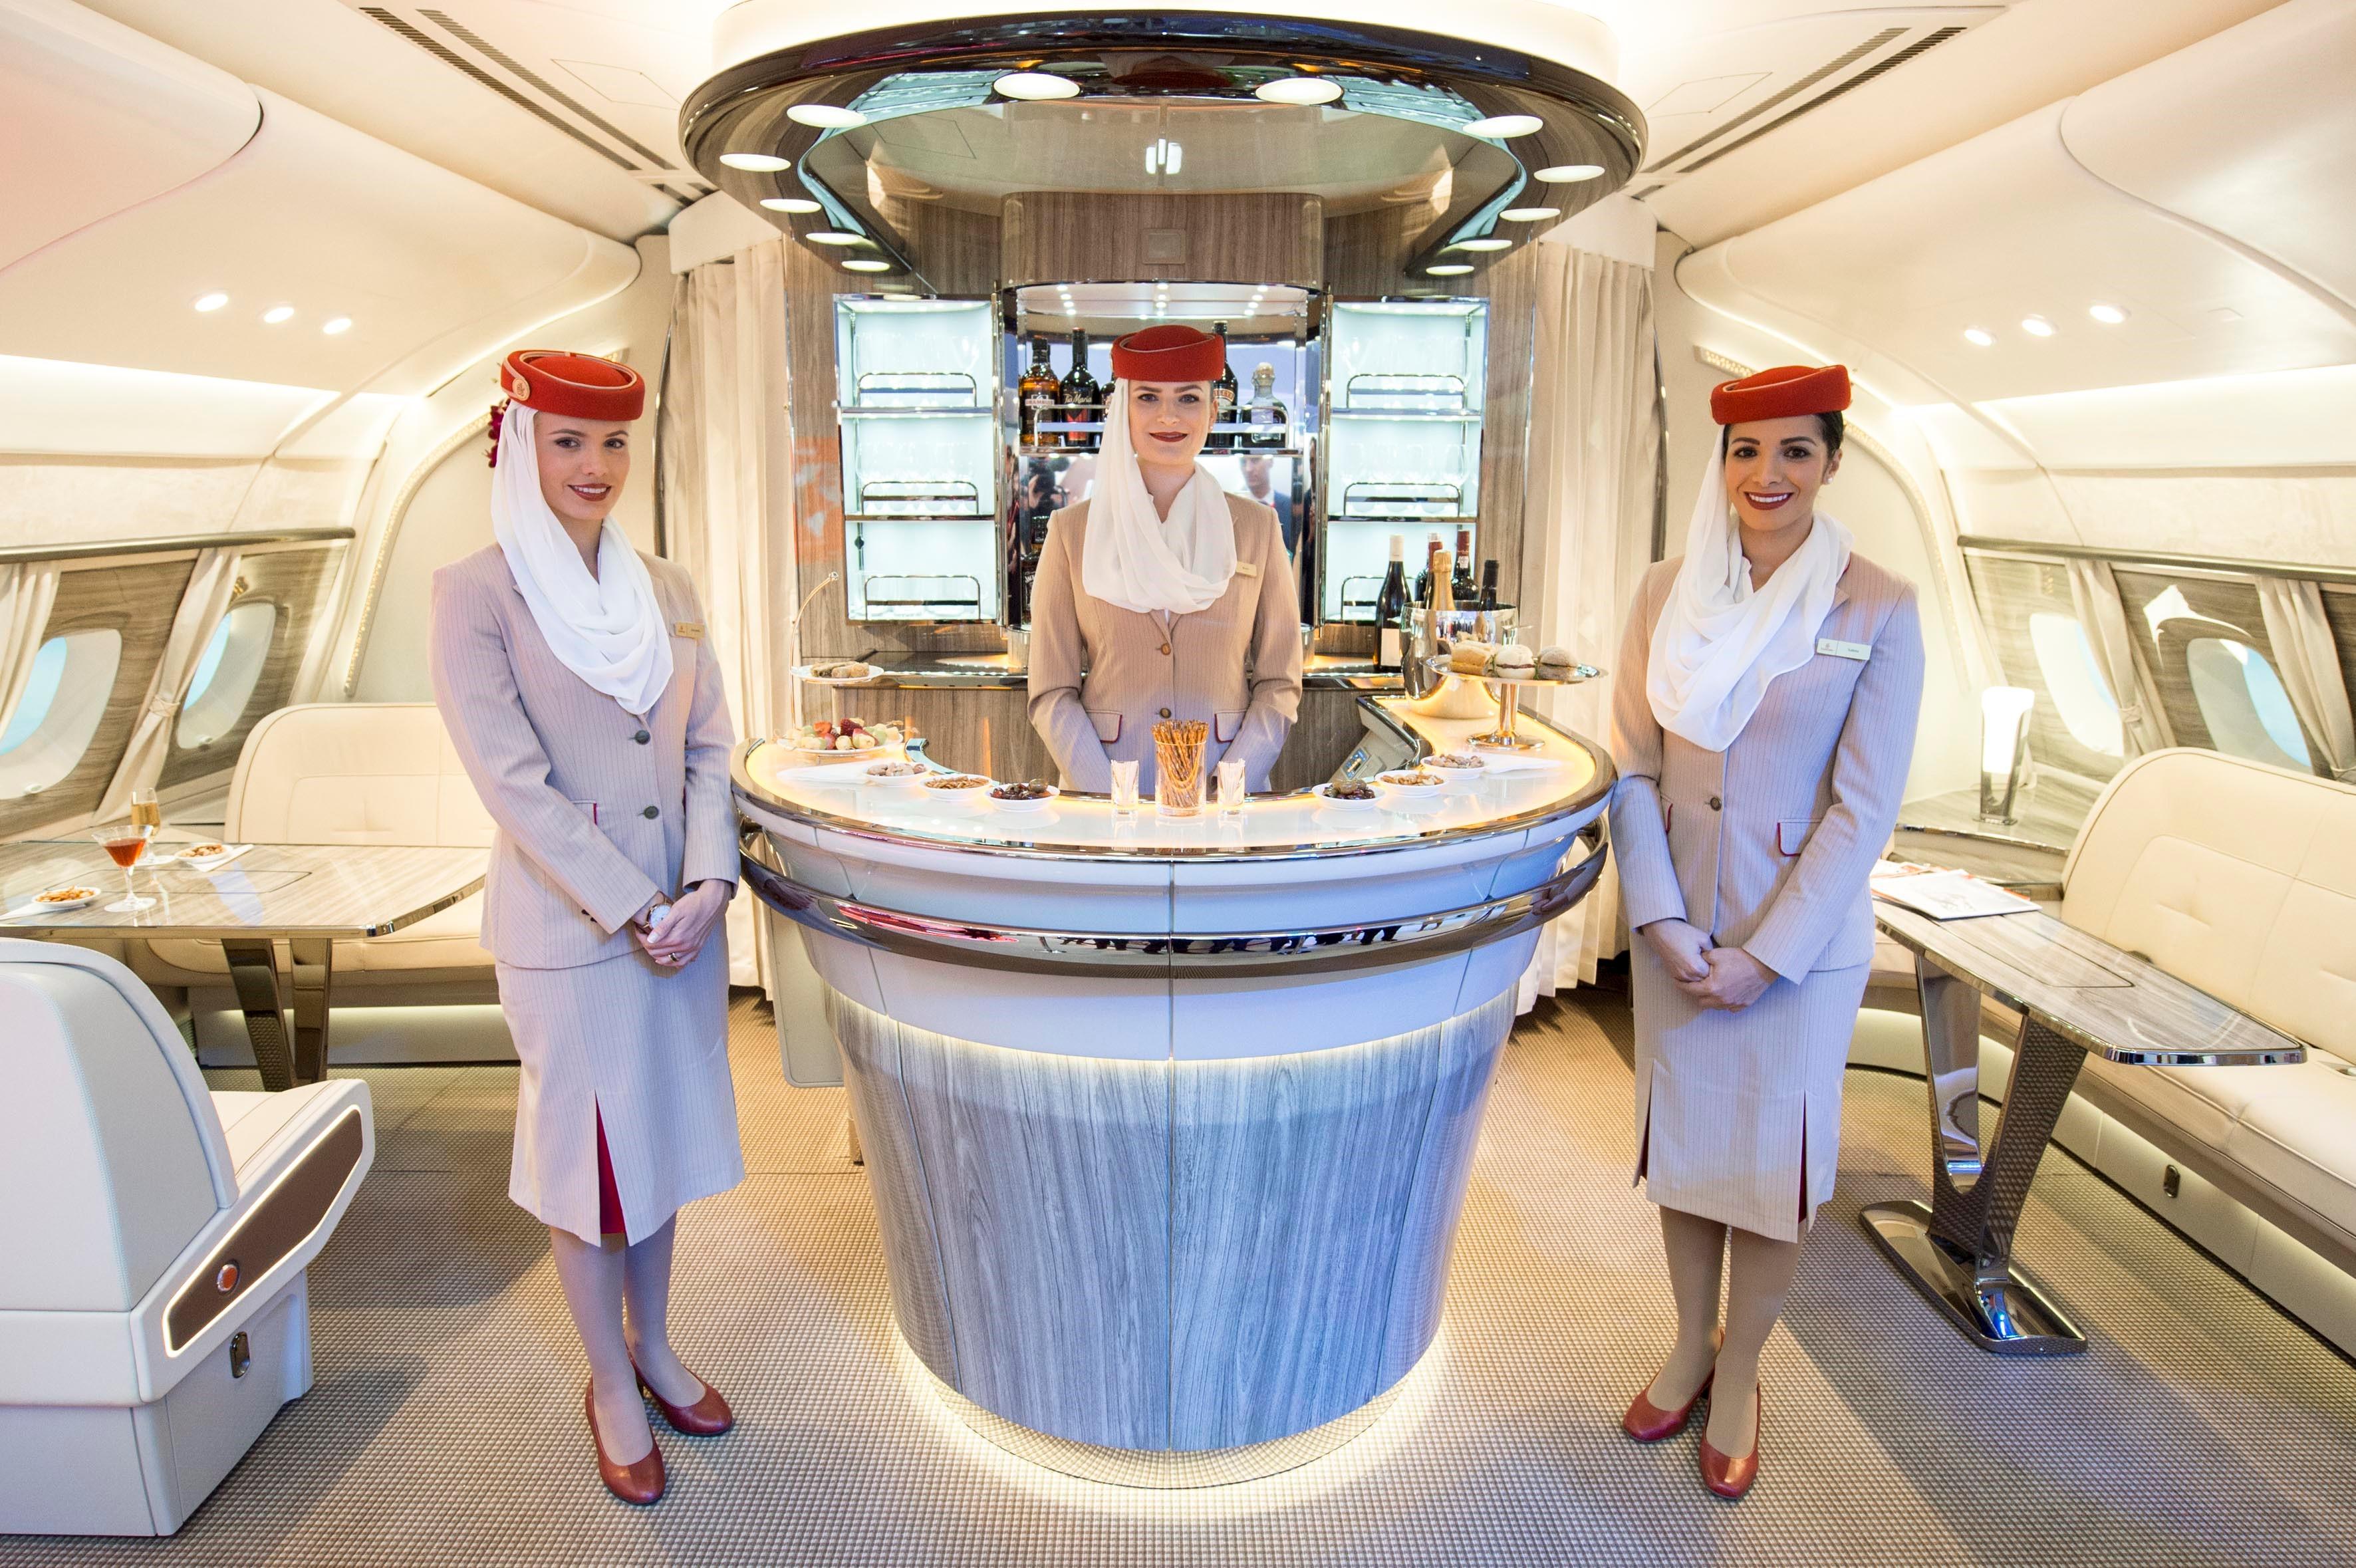 Dubai based Emirates Airlines is hiring cabin crew members